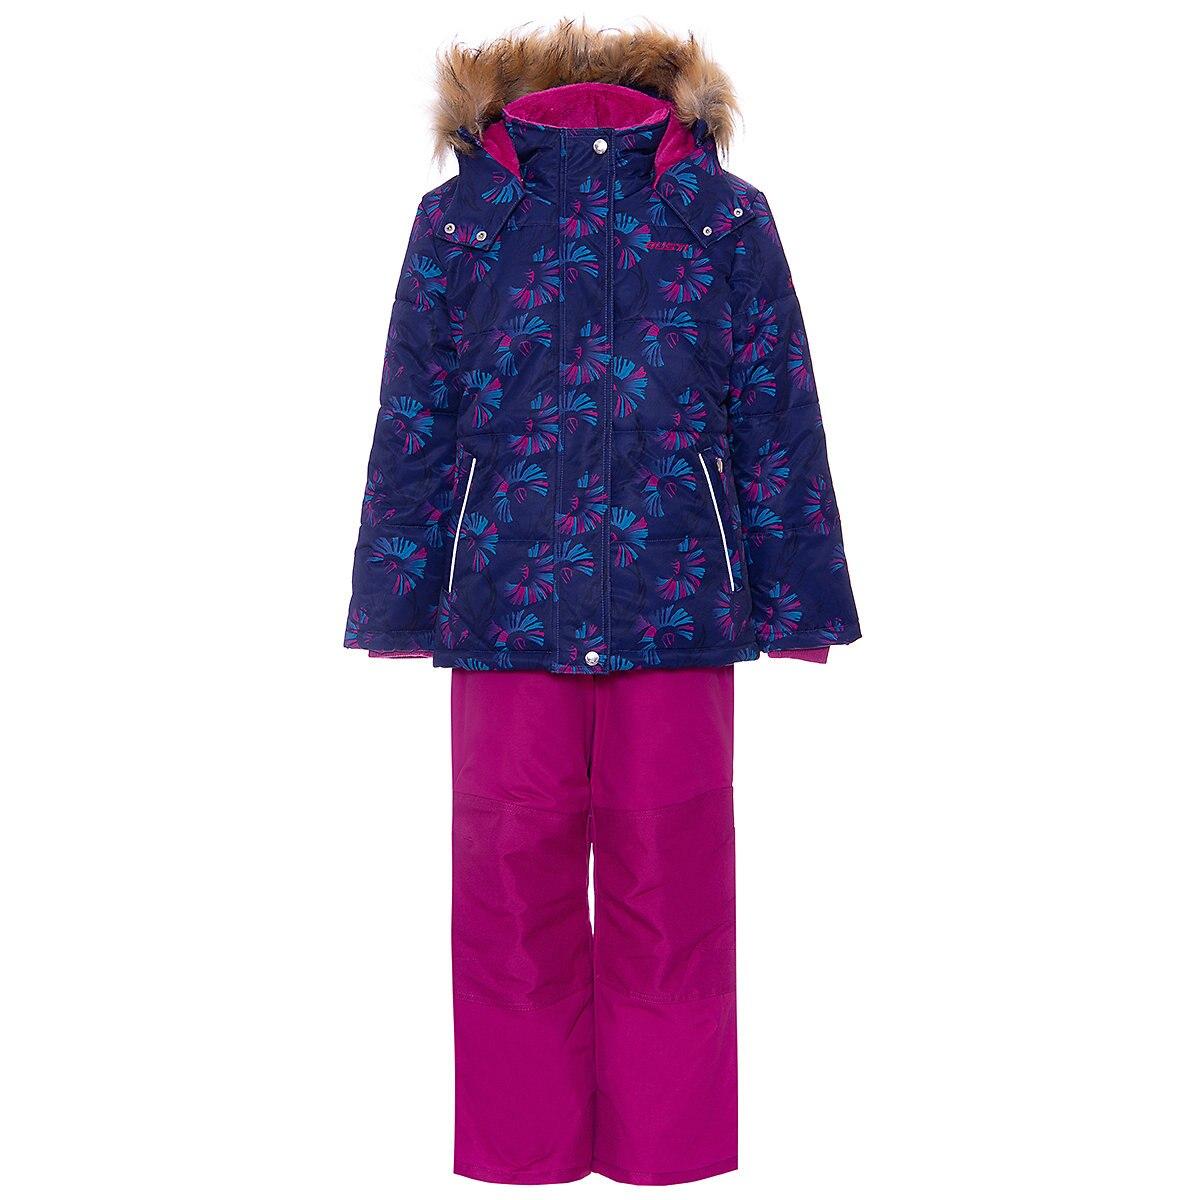 GUSTI enfants \'s ensembles 9512048 vêtements pour filles ensemble robe hiver vêtements fille enfants portent MTpromo